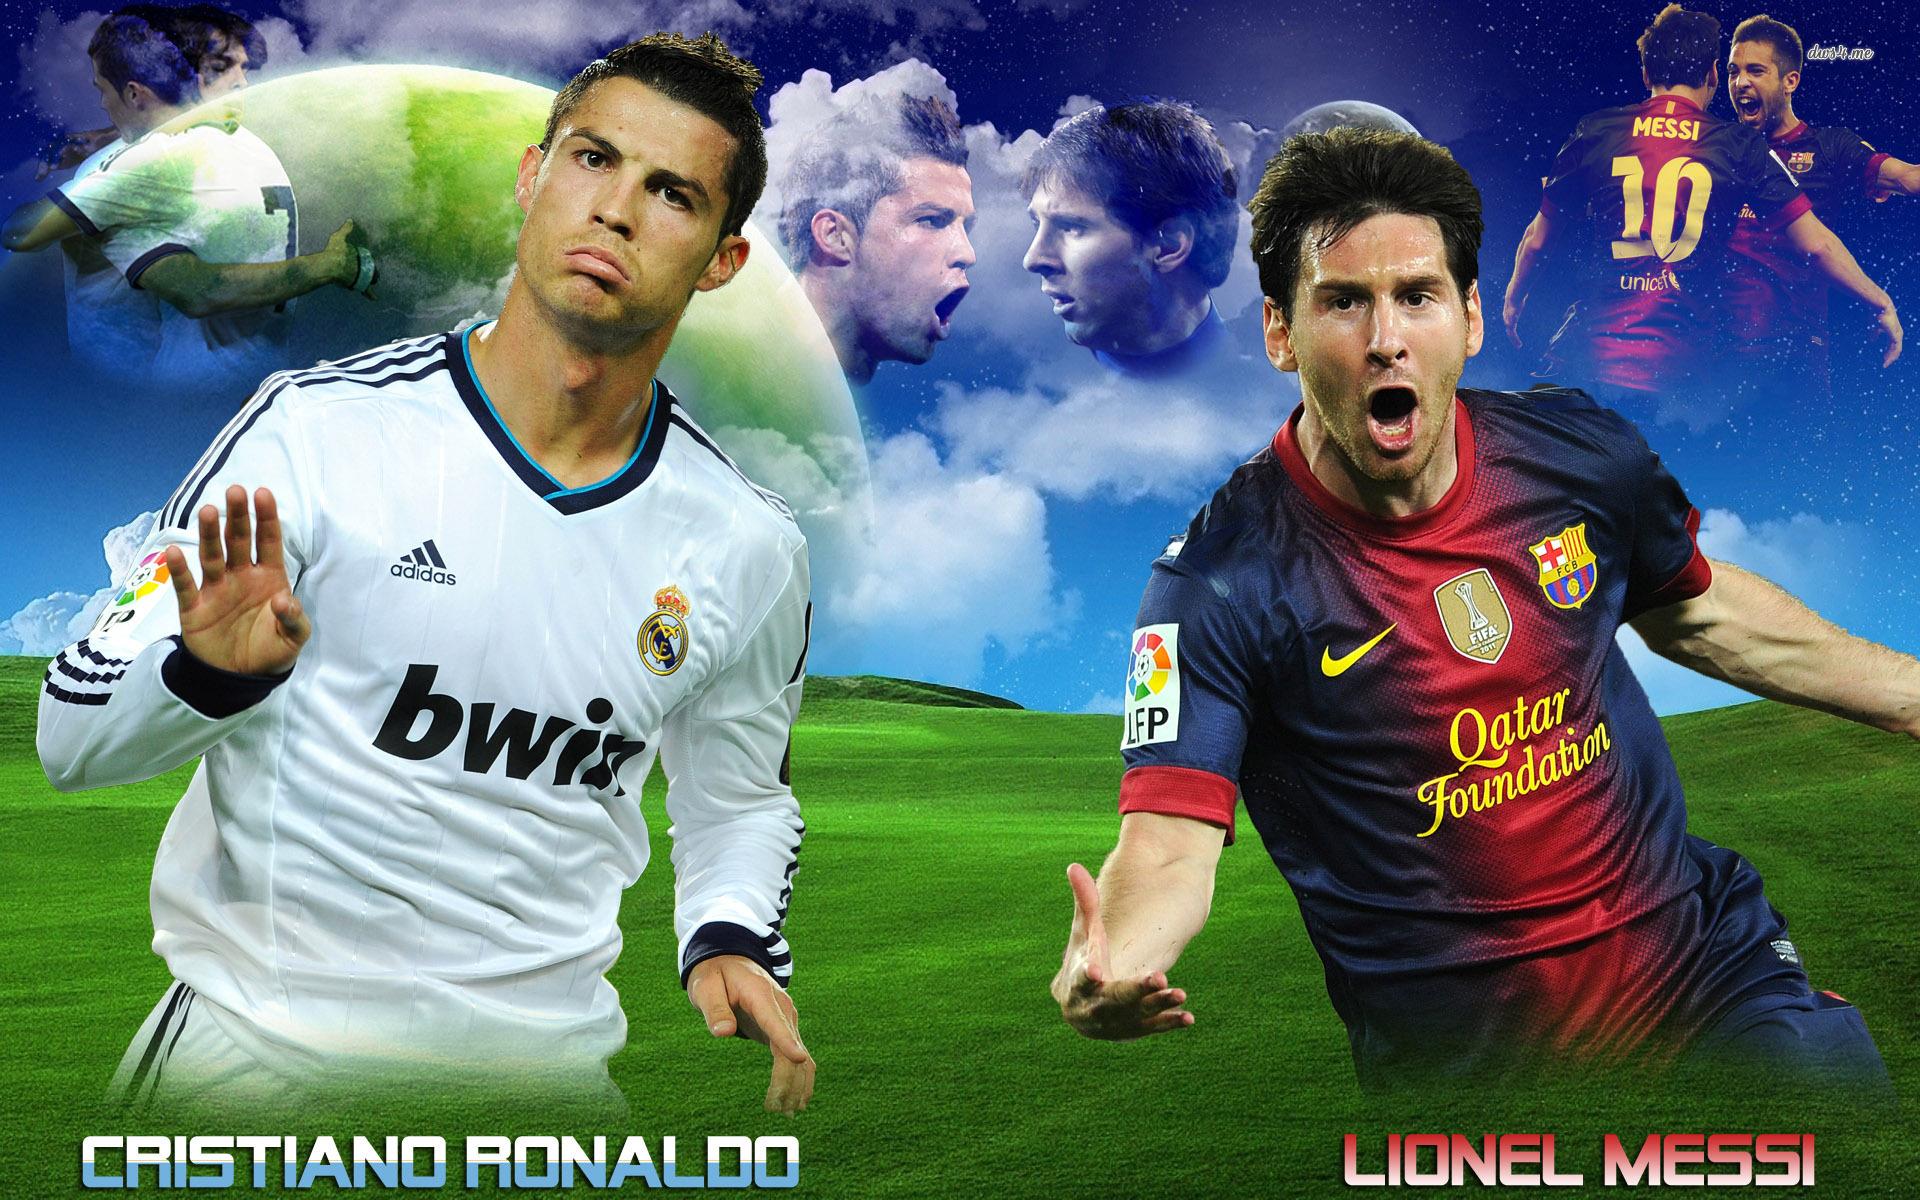 Cristiano Ronaldo Wallpapers HD Messi